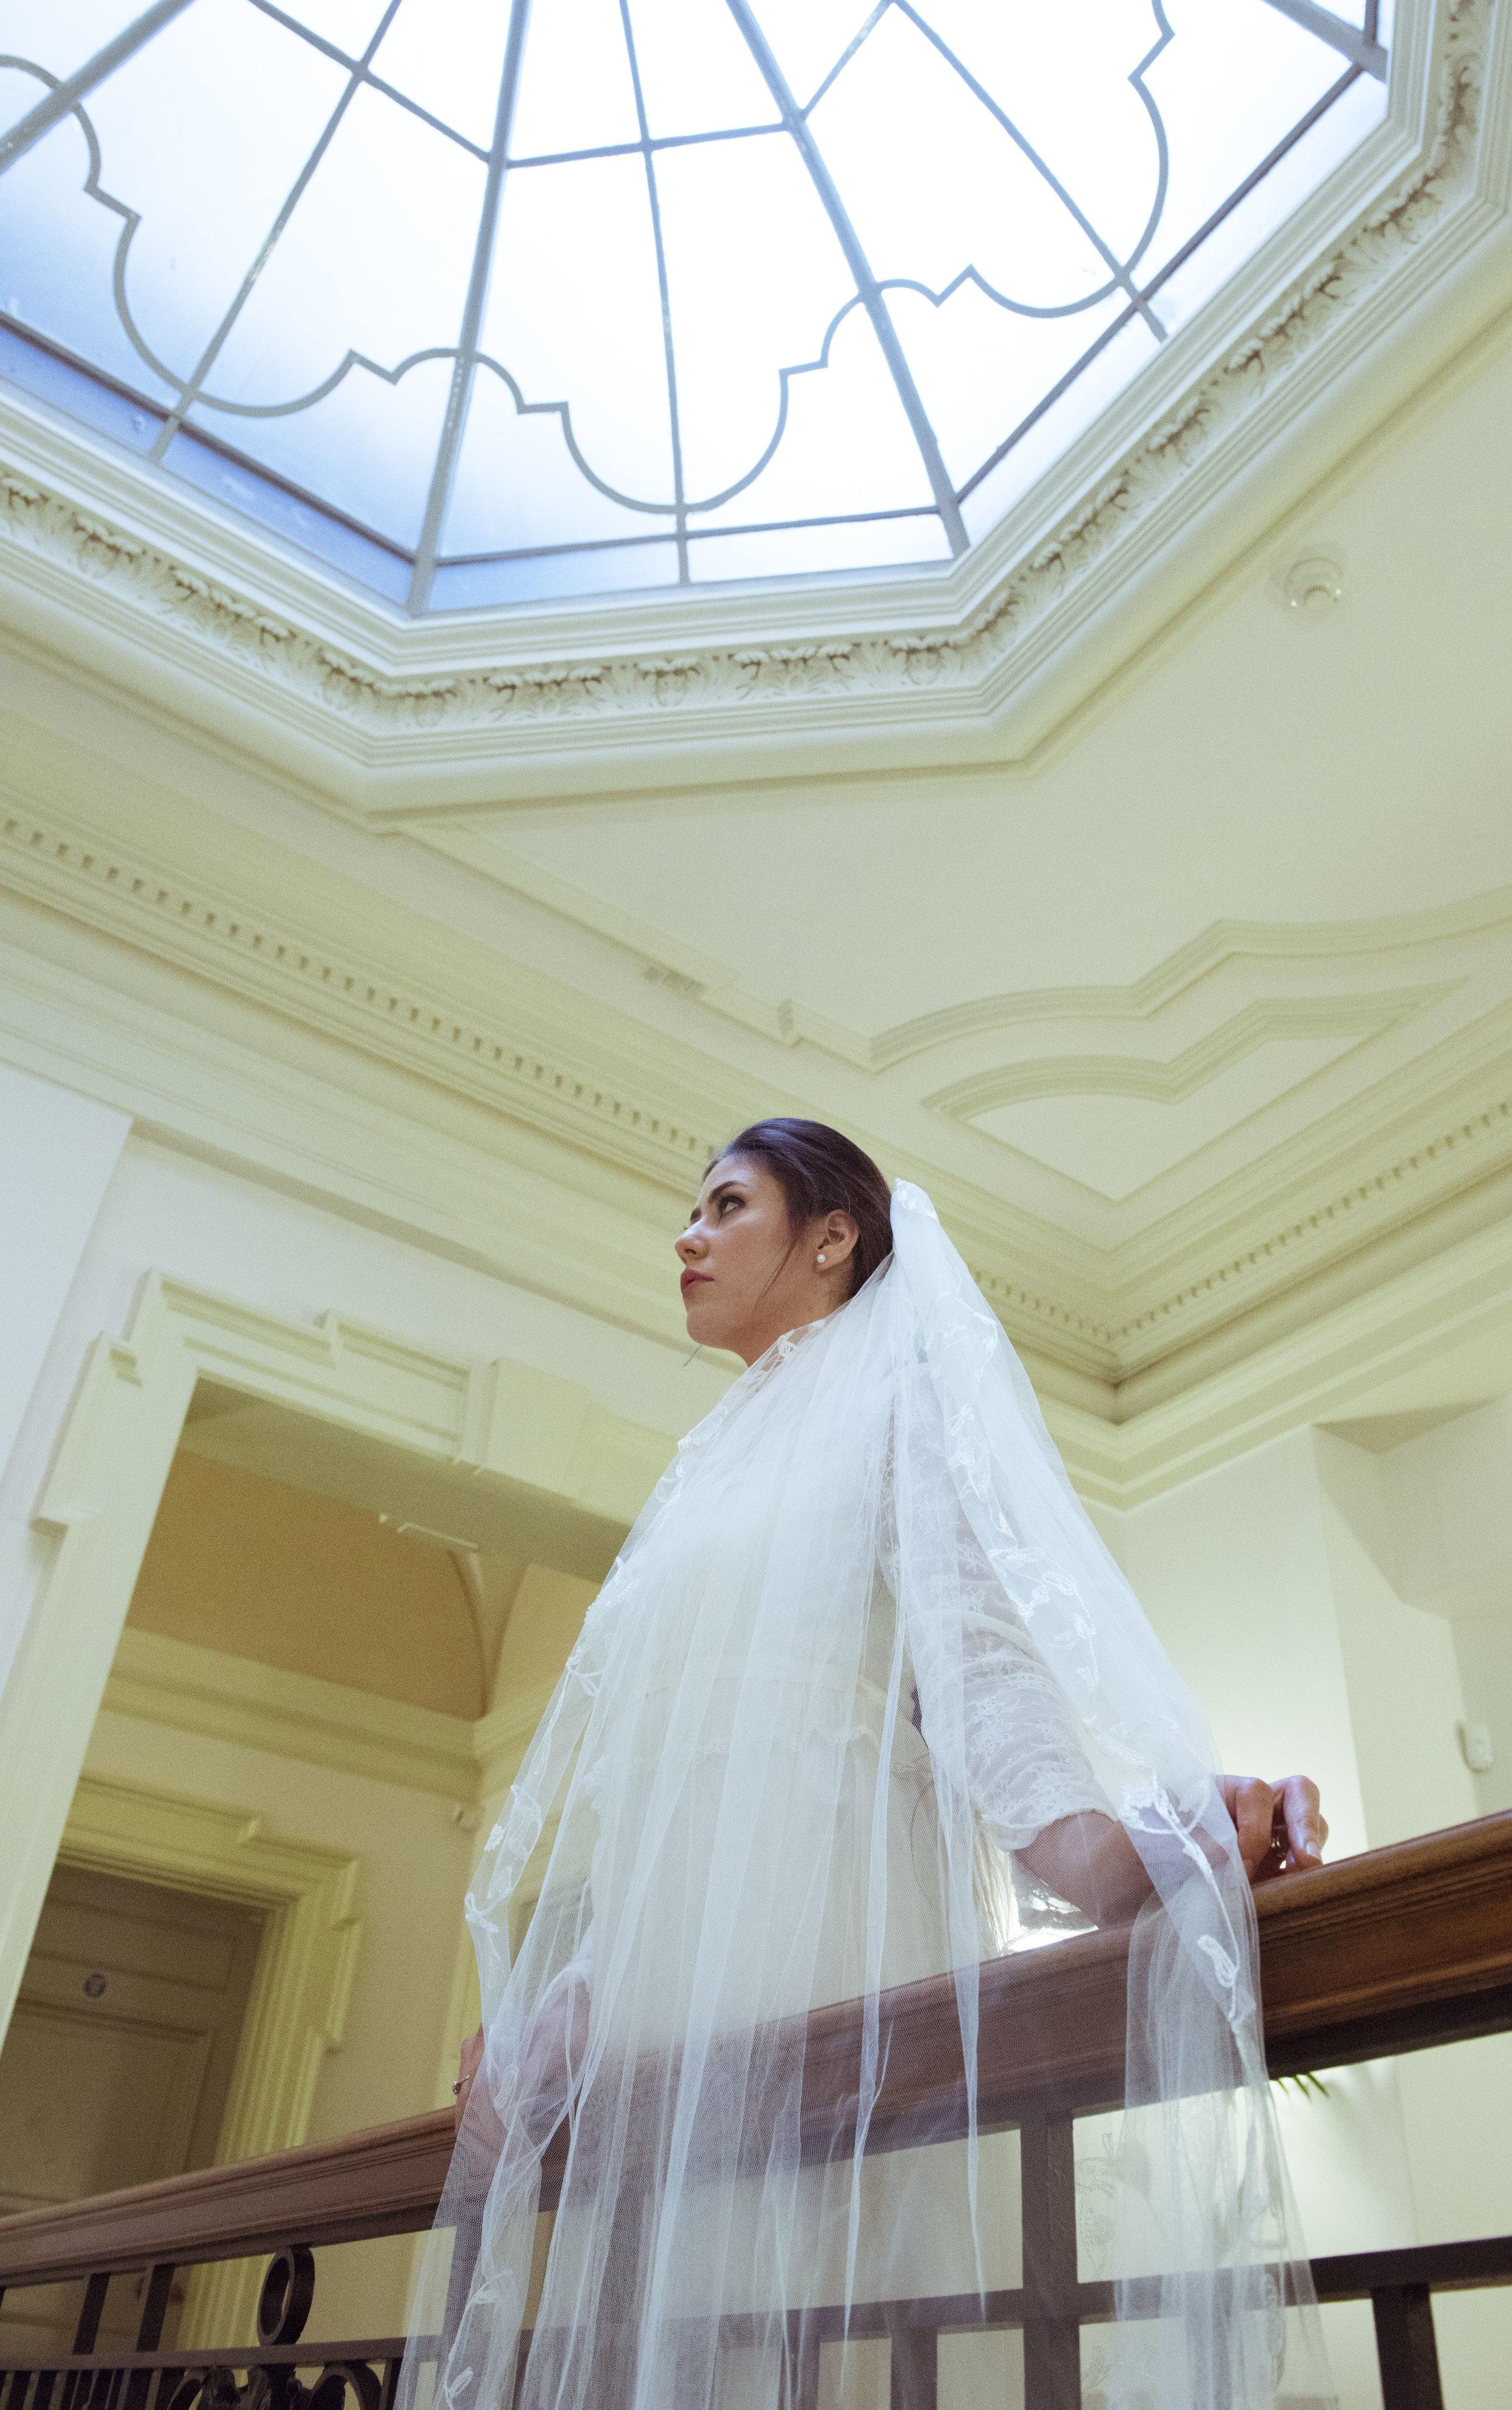 KERRY_CURL_ALEX_HILL_OPEN_NORWICH_WEDDING_SHOOT_NOV_2017-7077.jpg